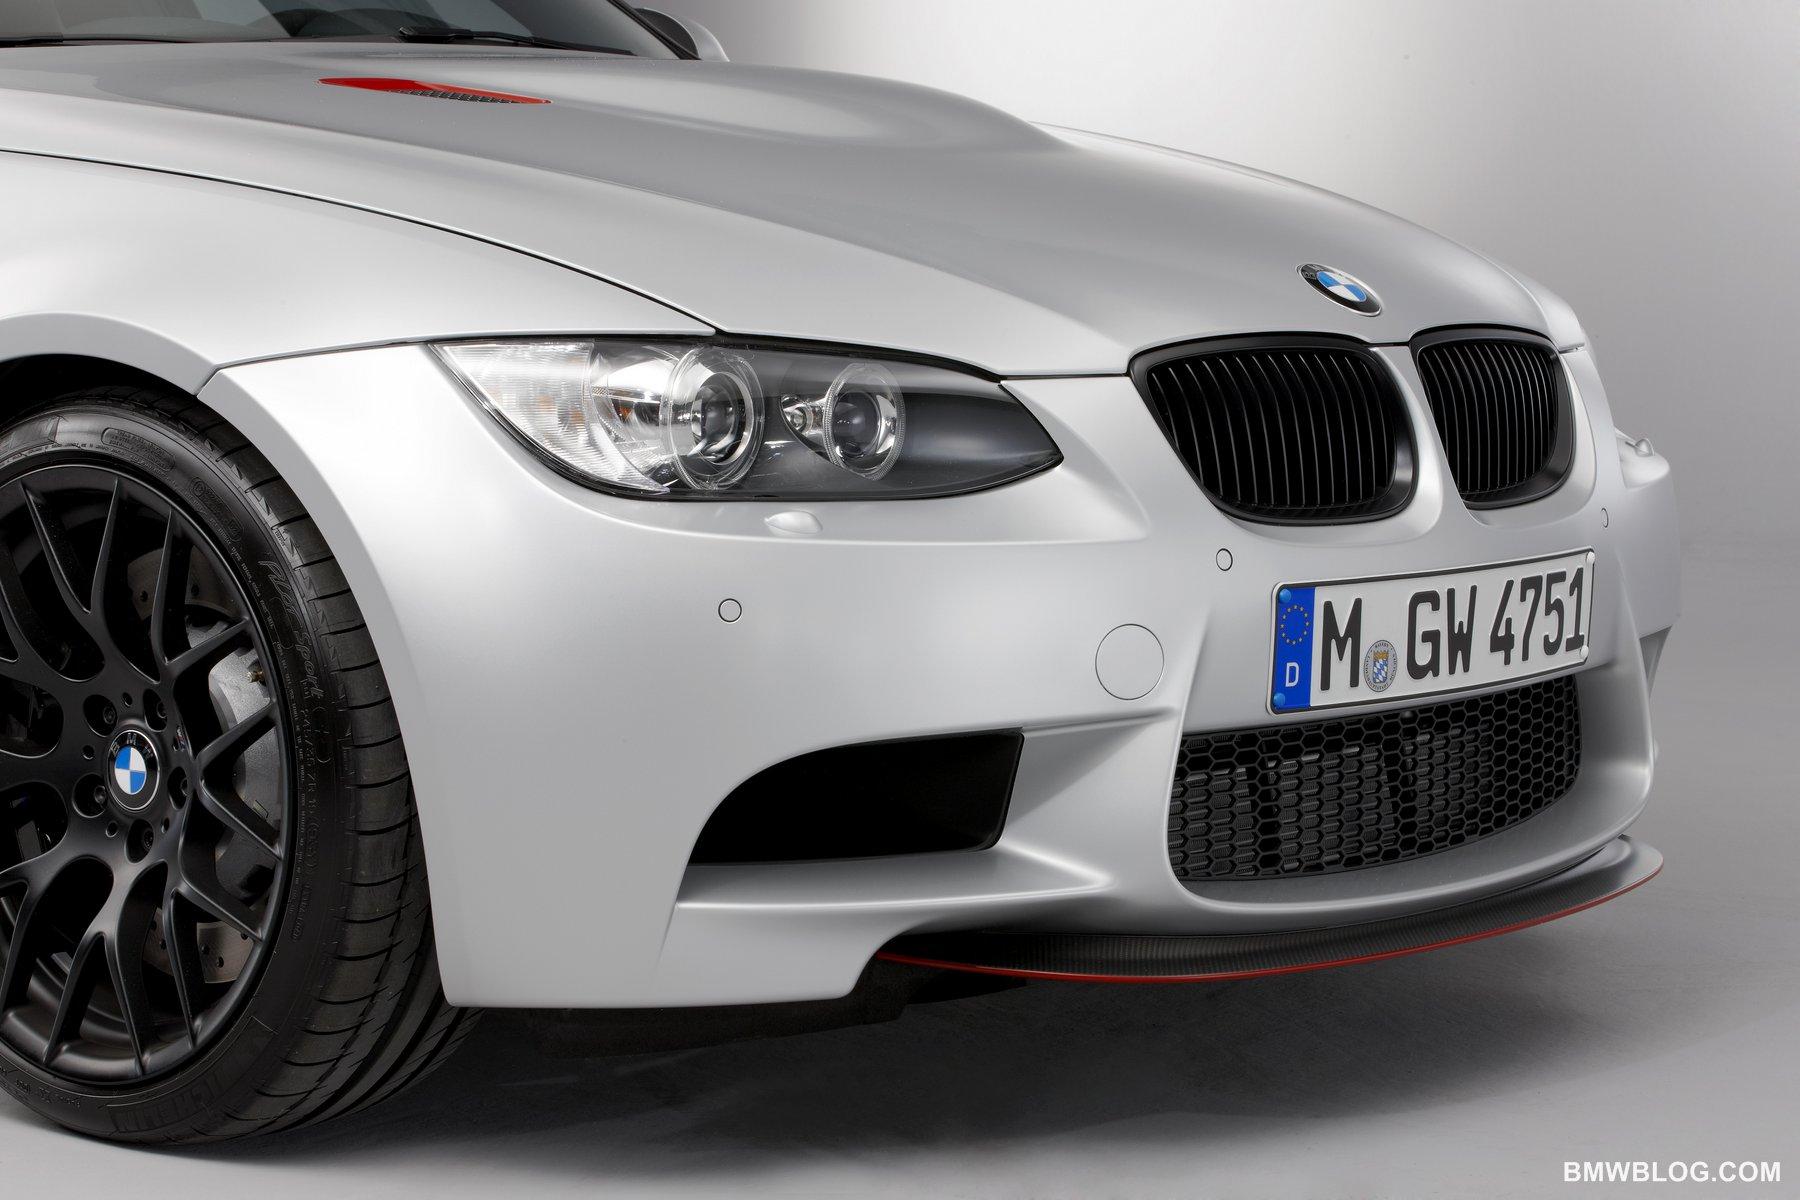 Motorcycle & ATV One layer Indoor Car Cover for 2011 BMW M3 CRT E90 4 door sedan/?saloon Motorcycle & ATV